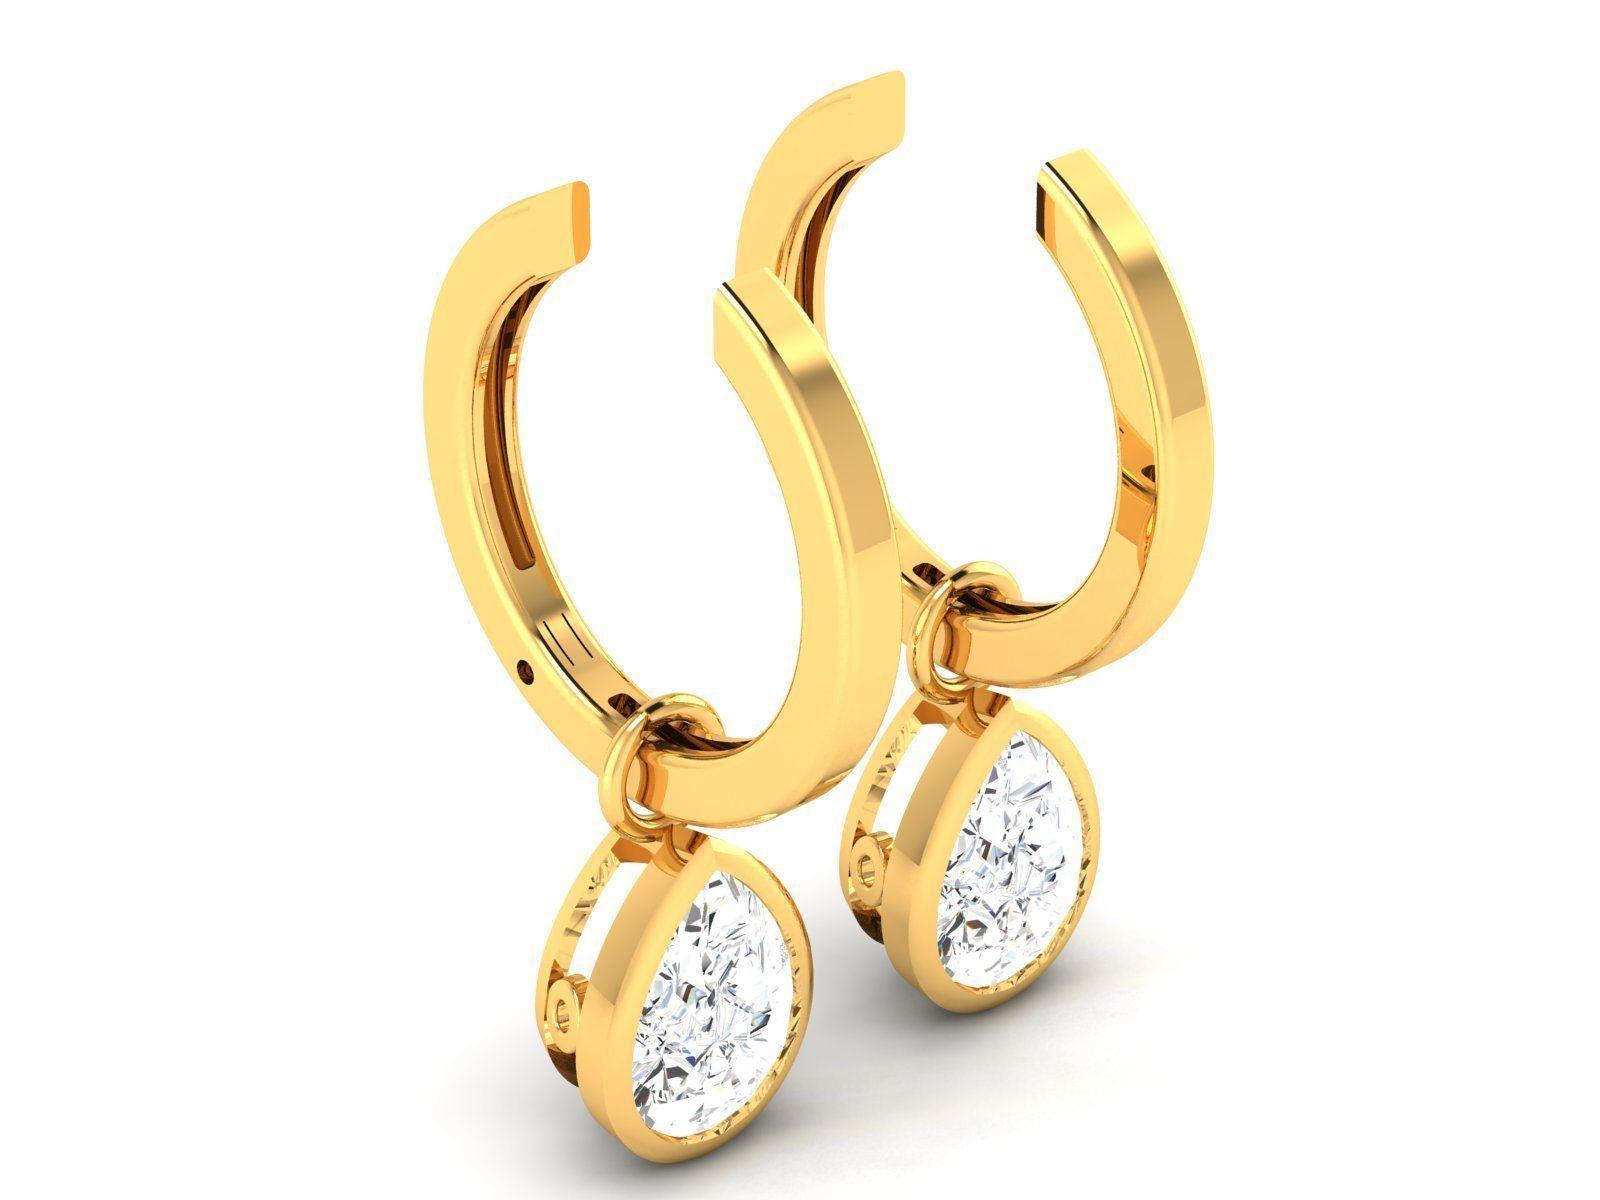 Women solitaire earrings 3dm render detail